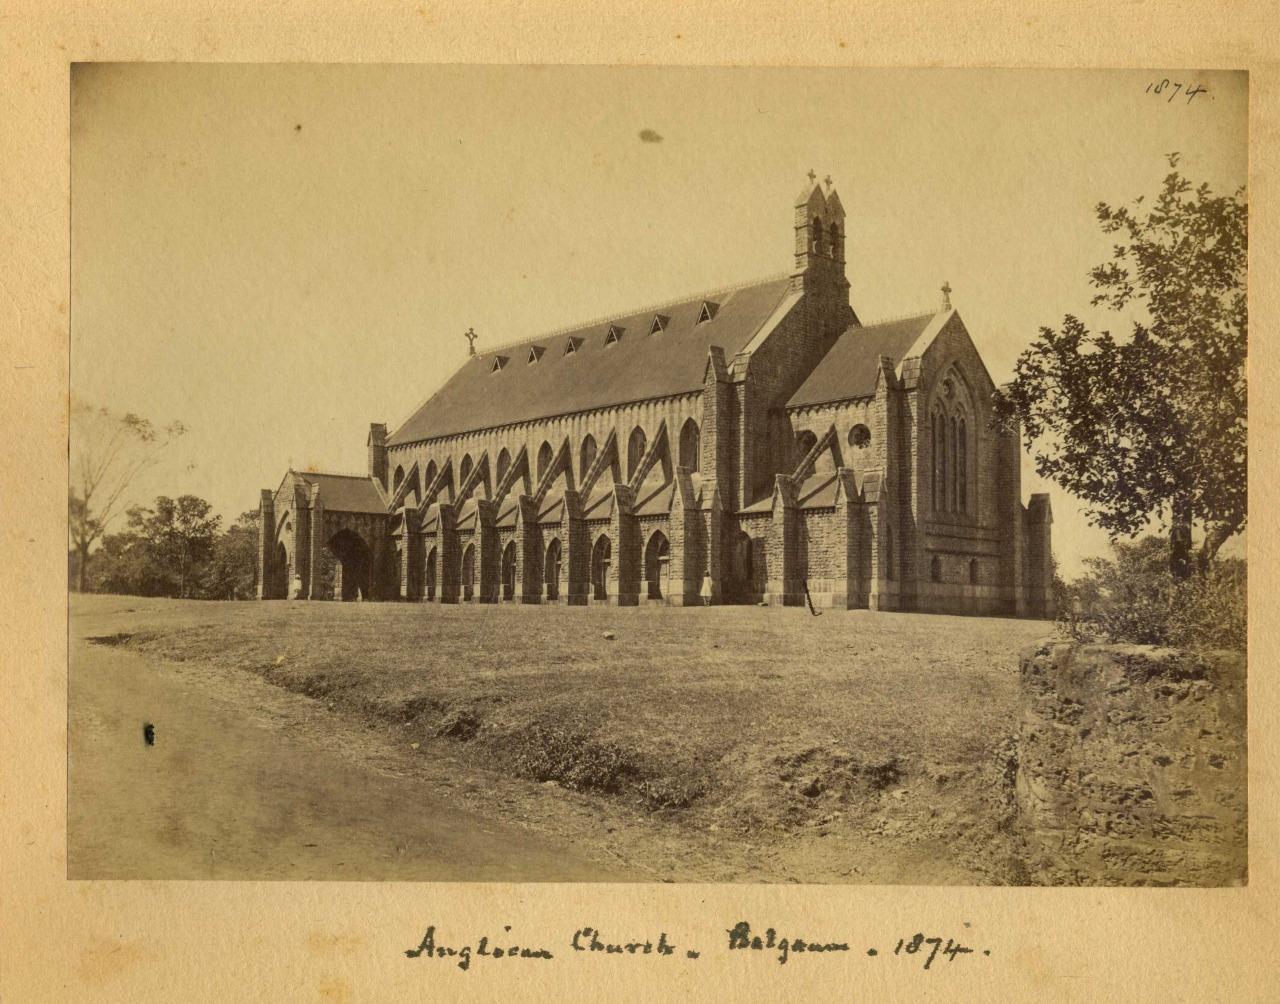 Anglican Church, India, 1874